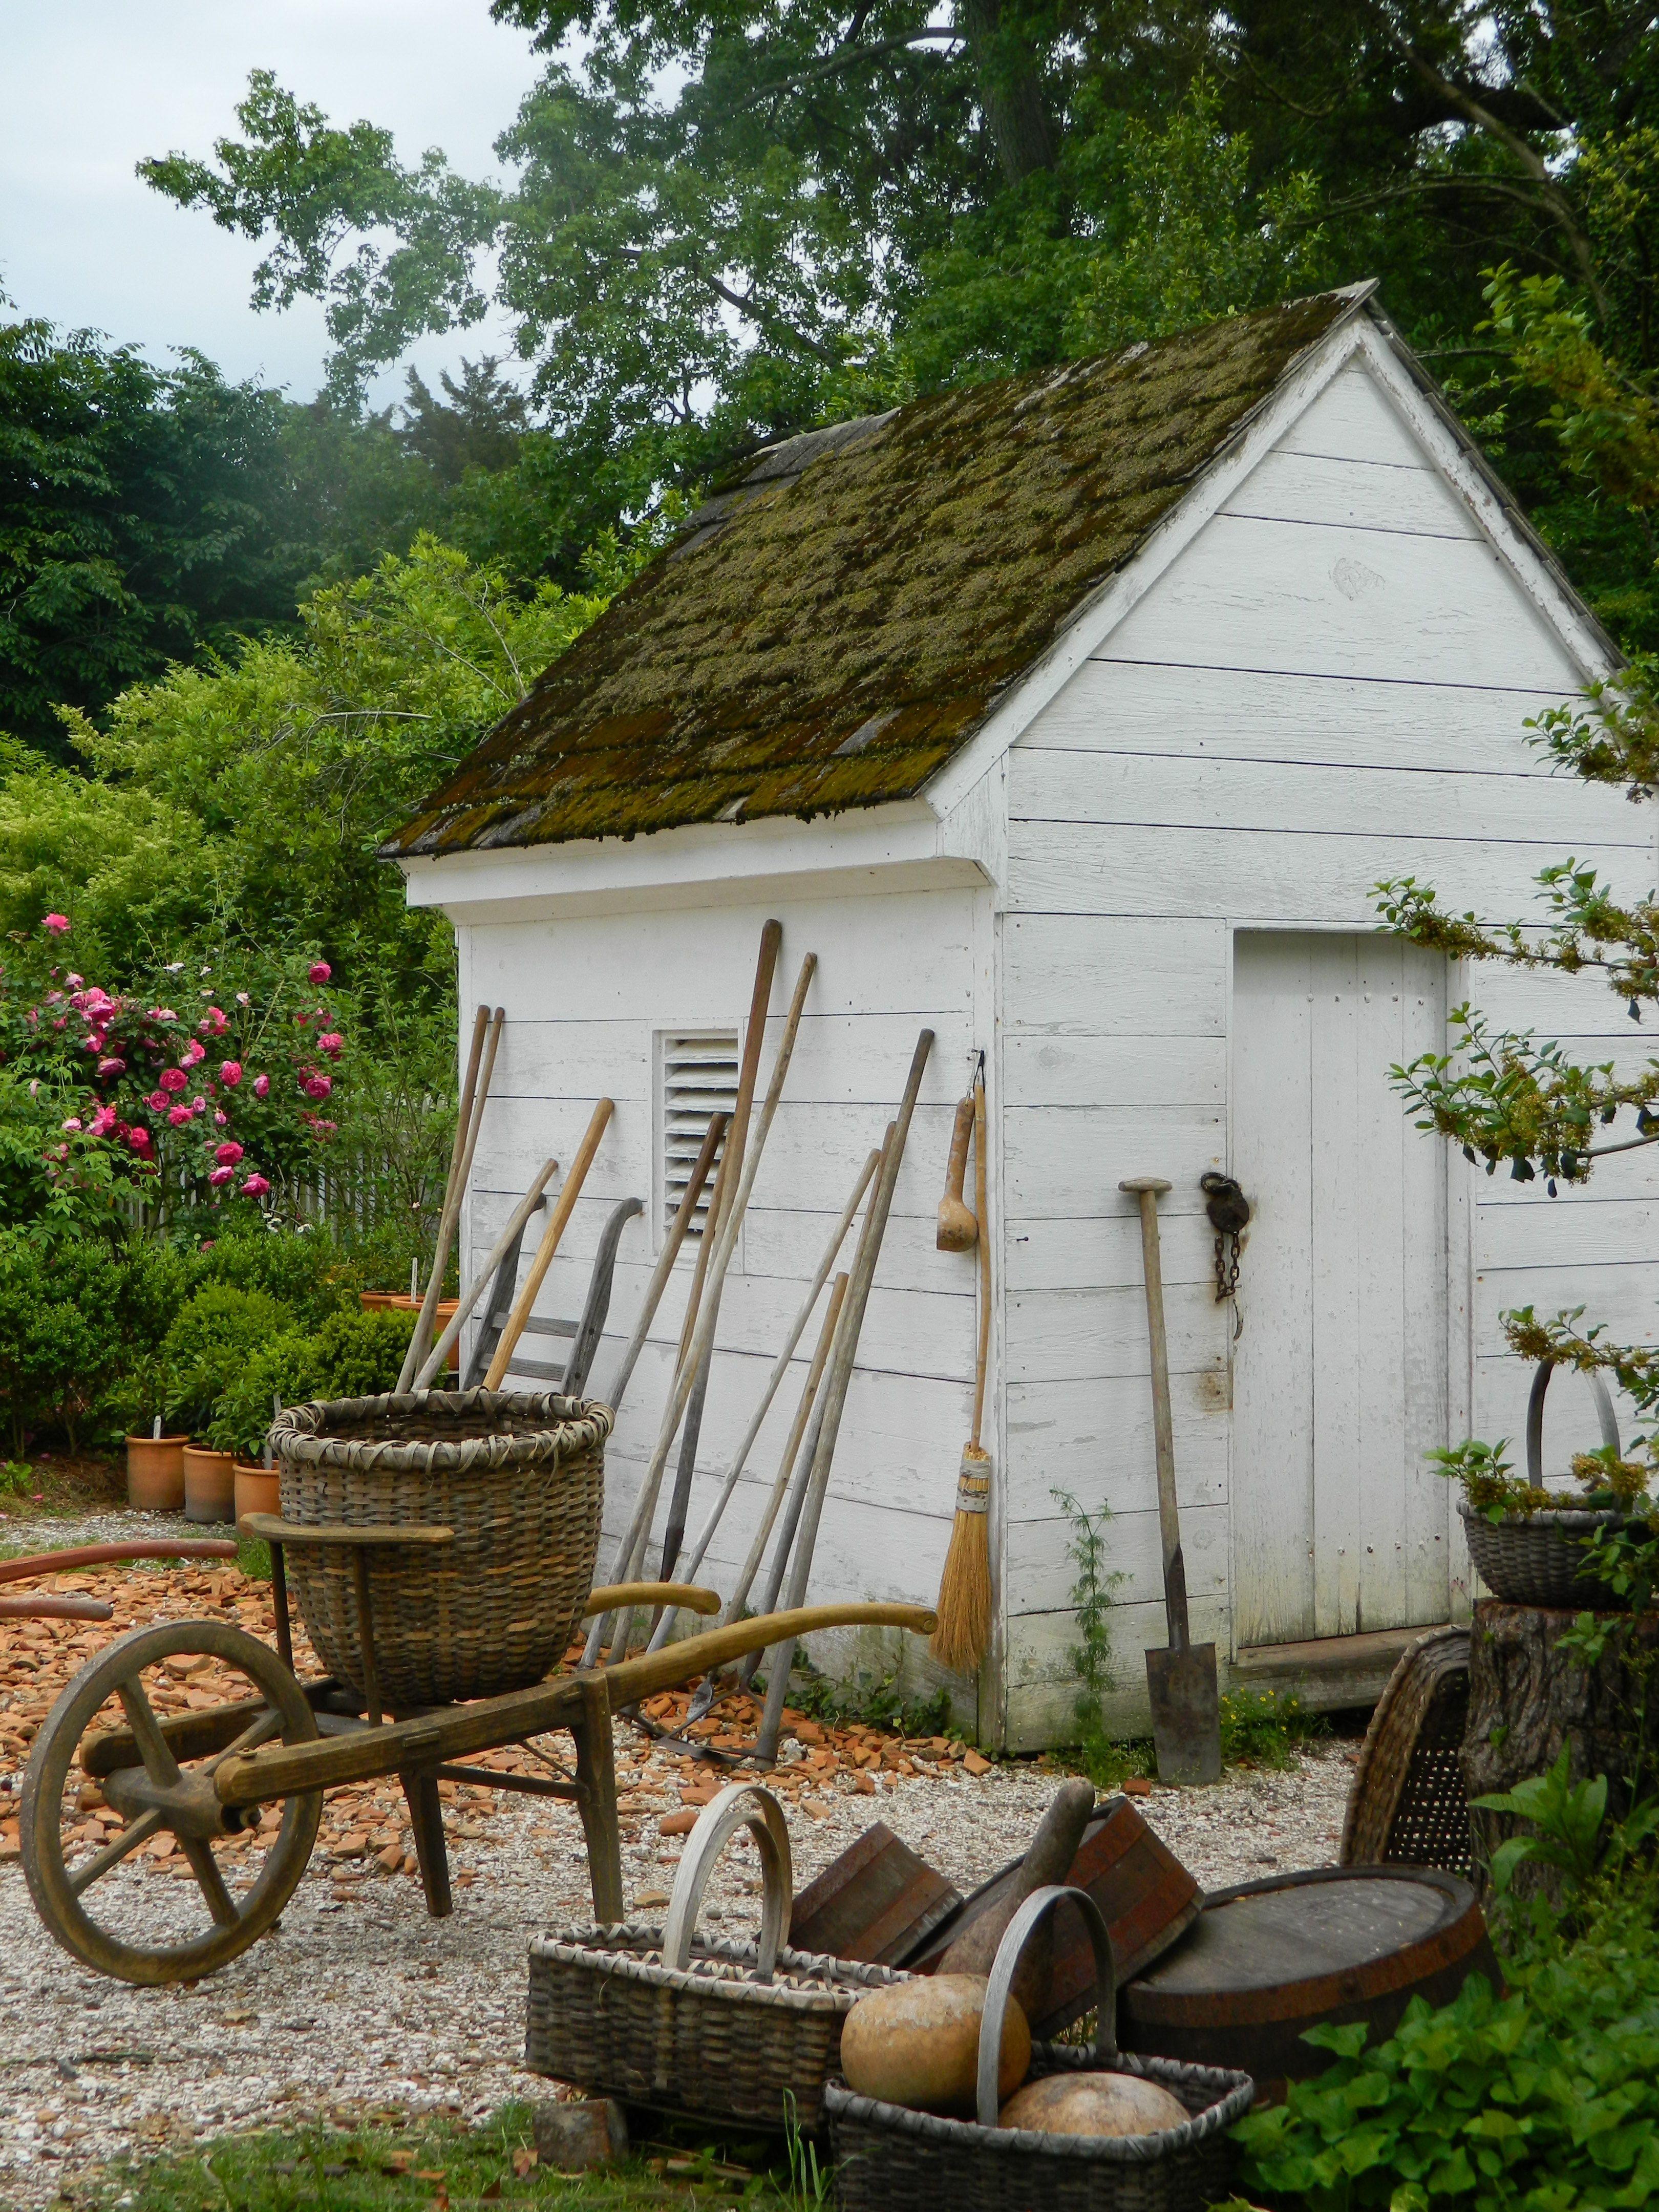 garden shed basket wheelbarrow tools - Garden Sheds Reading